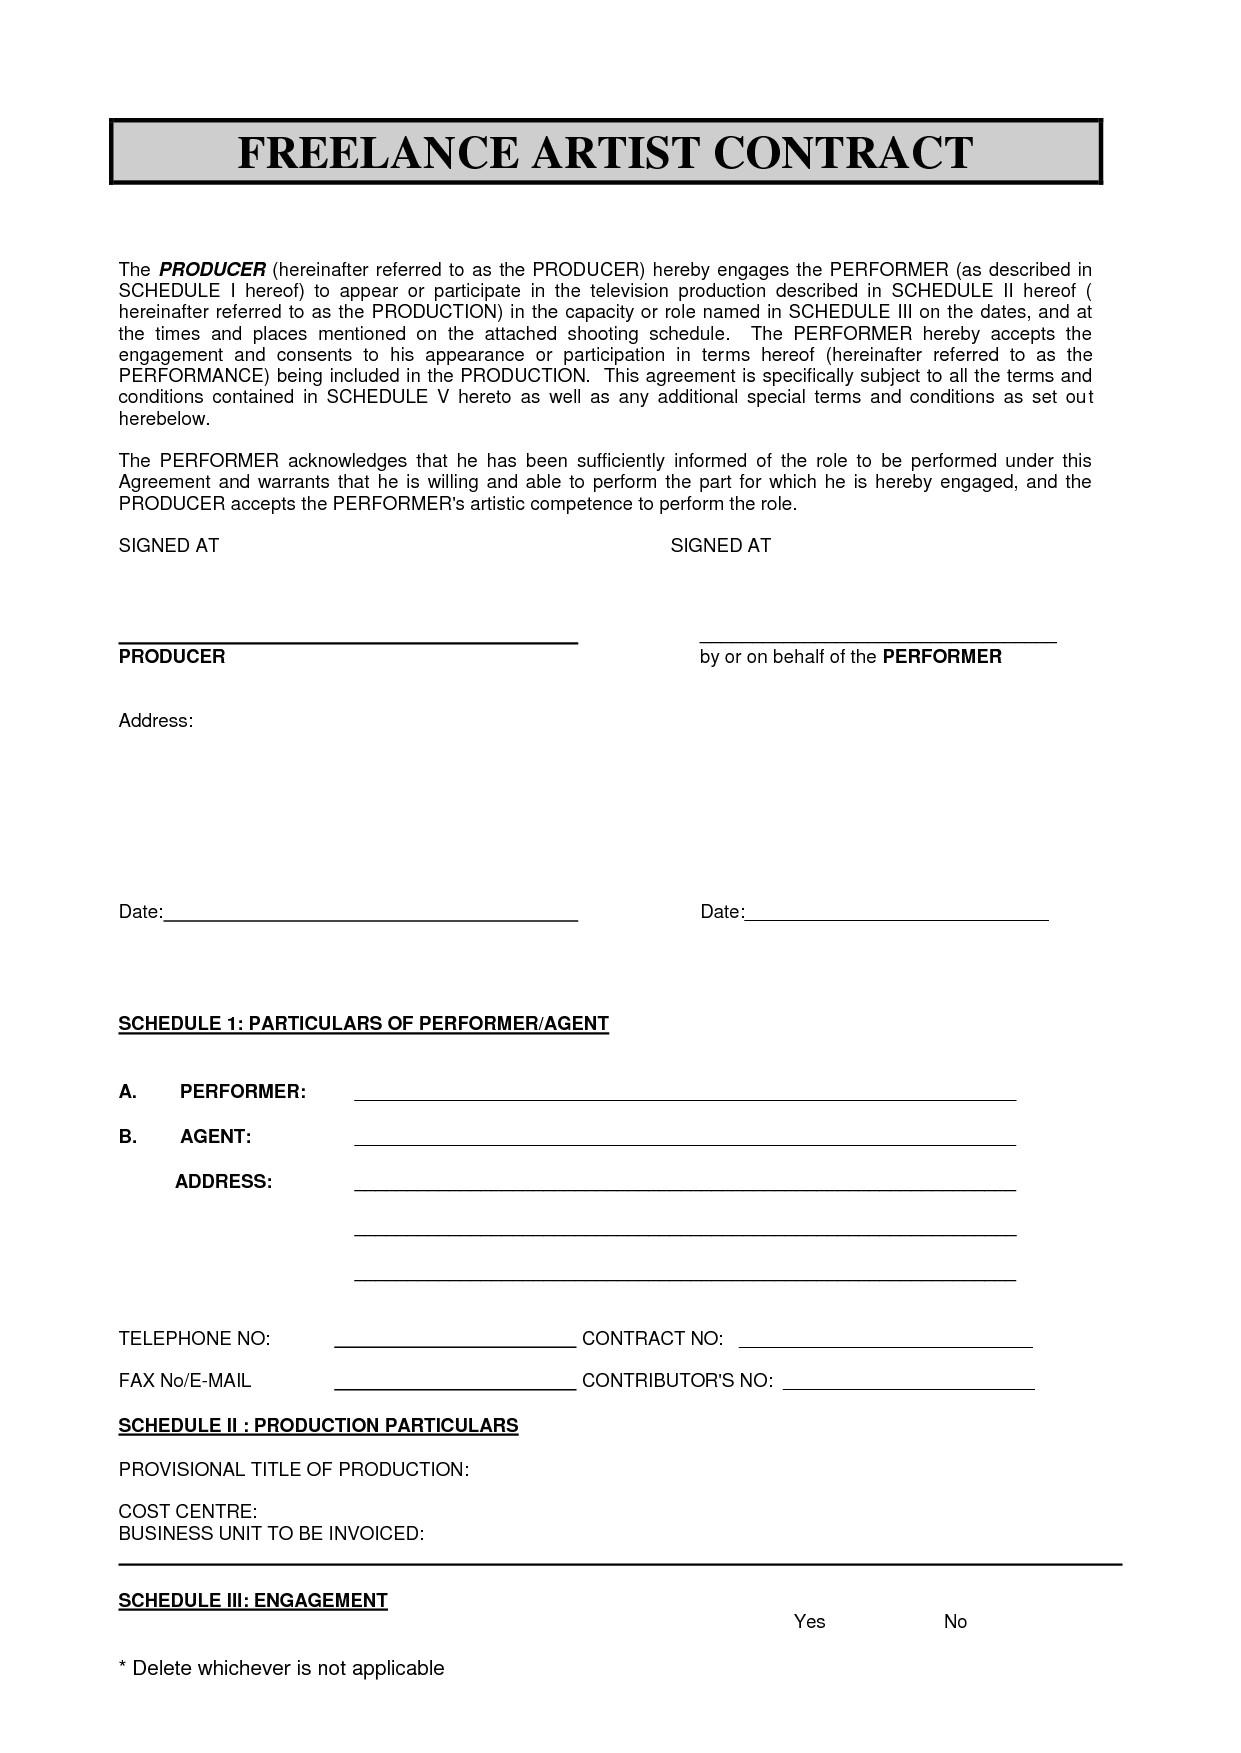 Freelance Makeup Artist Contract Templates Sabc Contract 2010 Pdf Freelance Artist Contract by